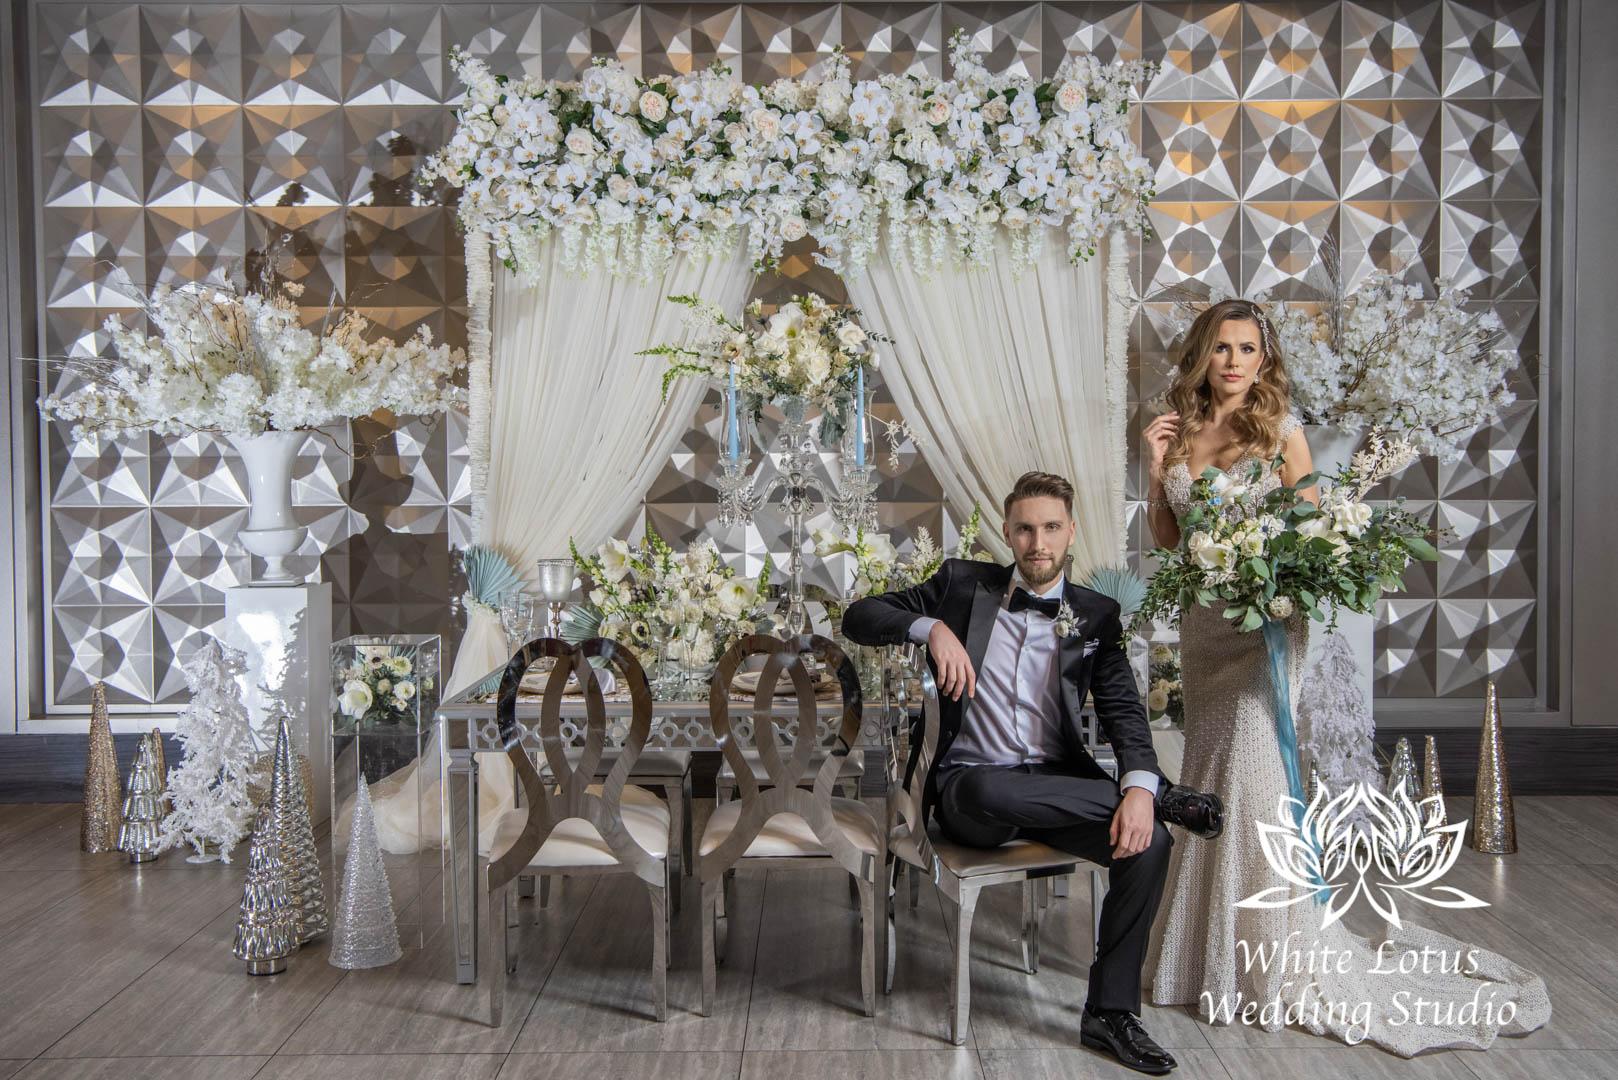 143- GLAM WINTERLUXE WEDDING INSPIRATION